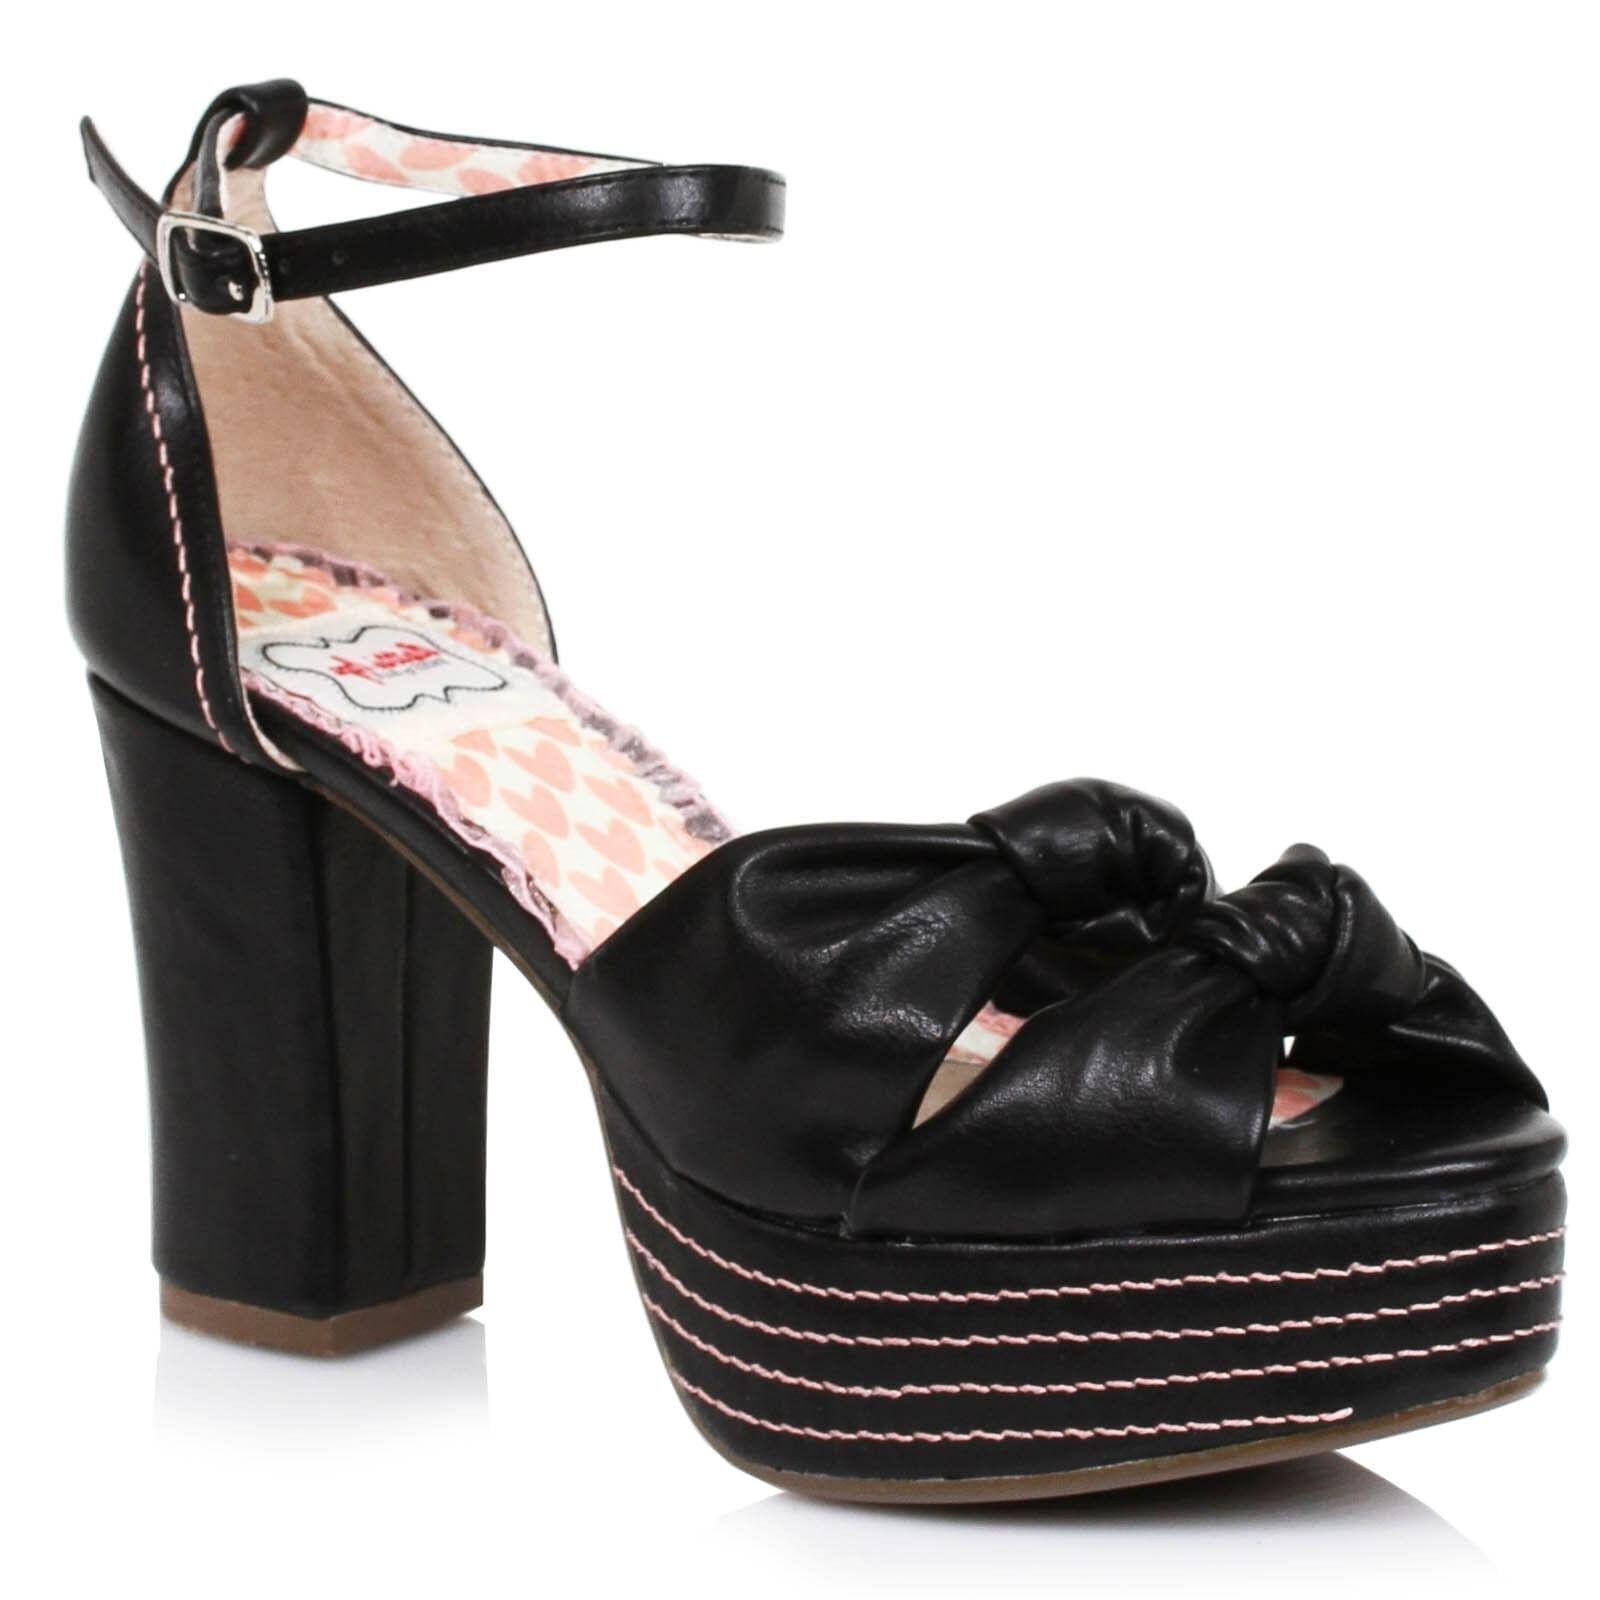 confortevole Bettie Page scarpe Jessy Platform Heel Heel Heel Retro nero Dimensione 7  prezzo basso